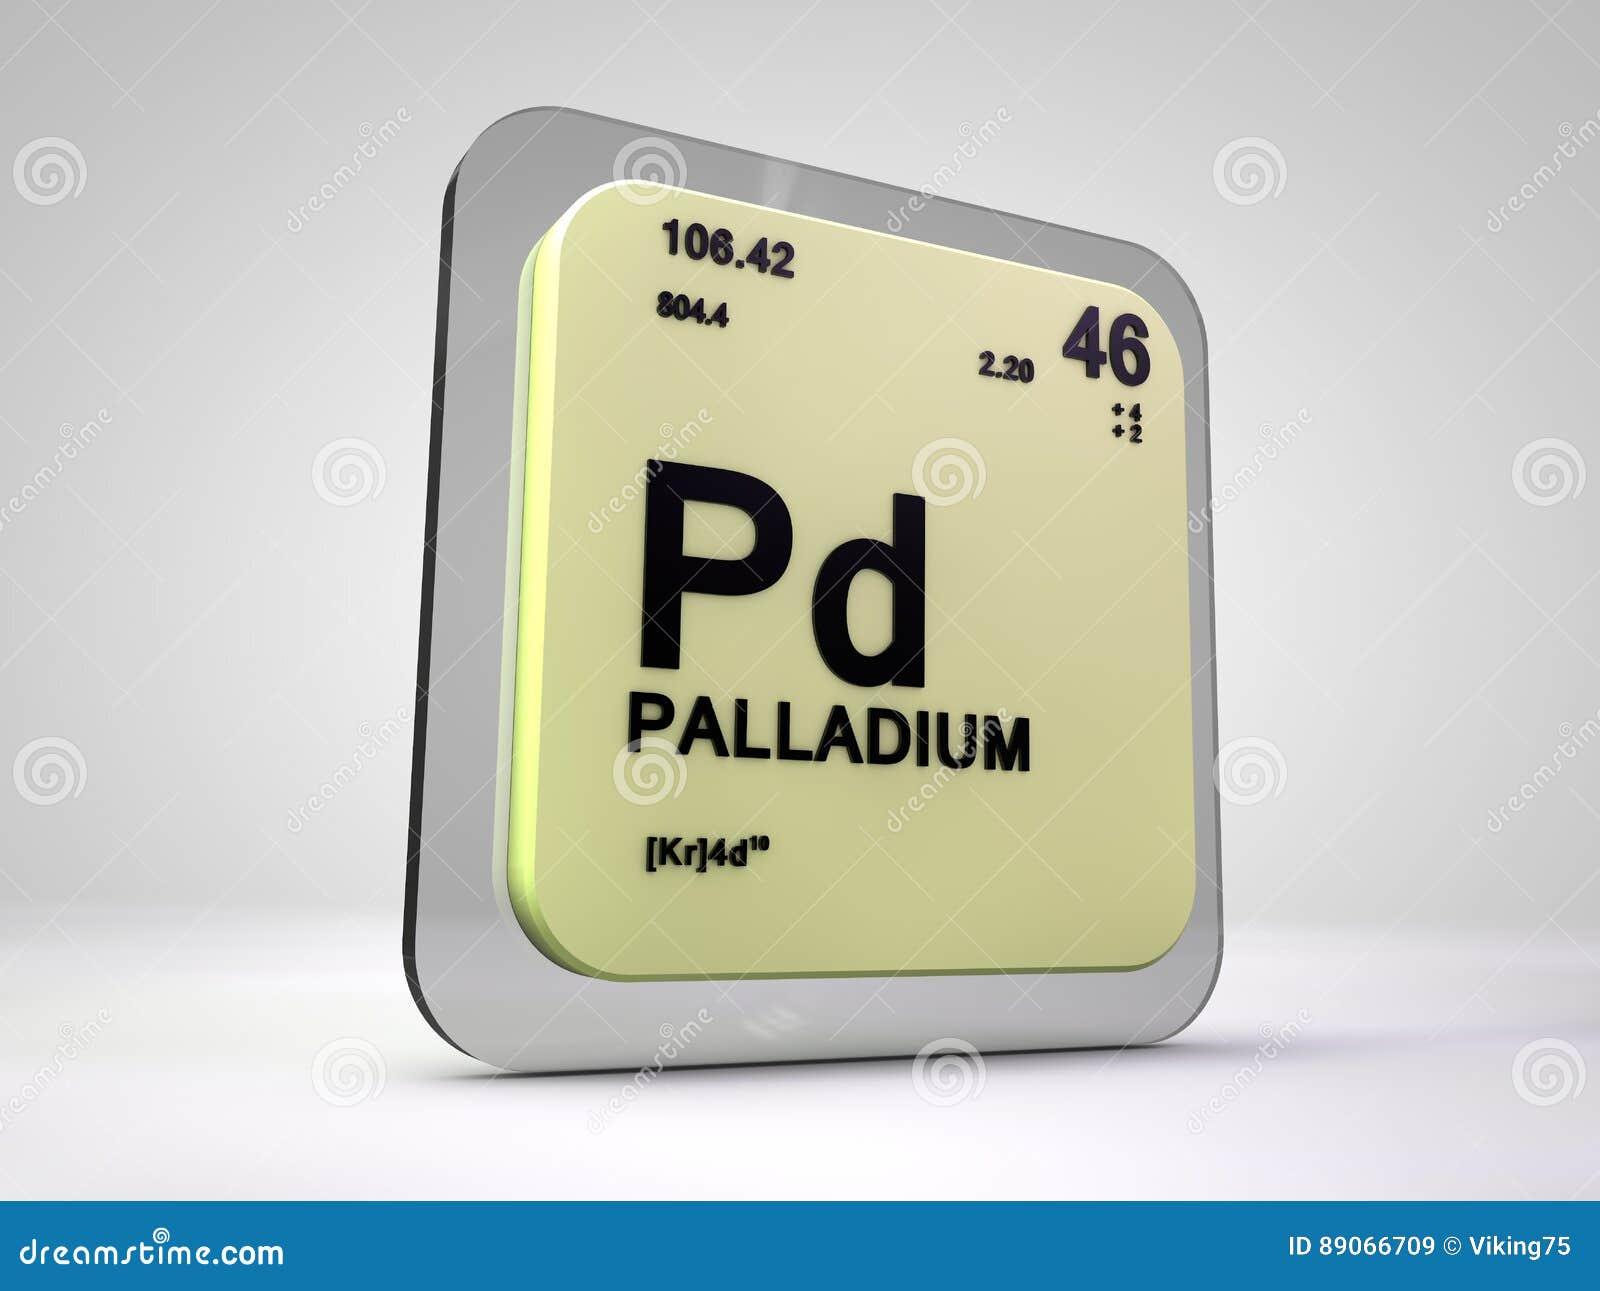 Palladium Pd Chemical Element Periodic Table Stock Illustration